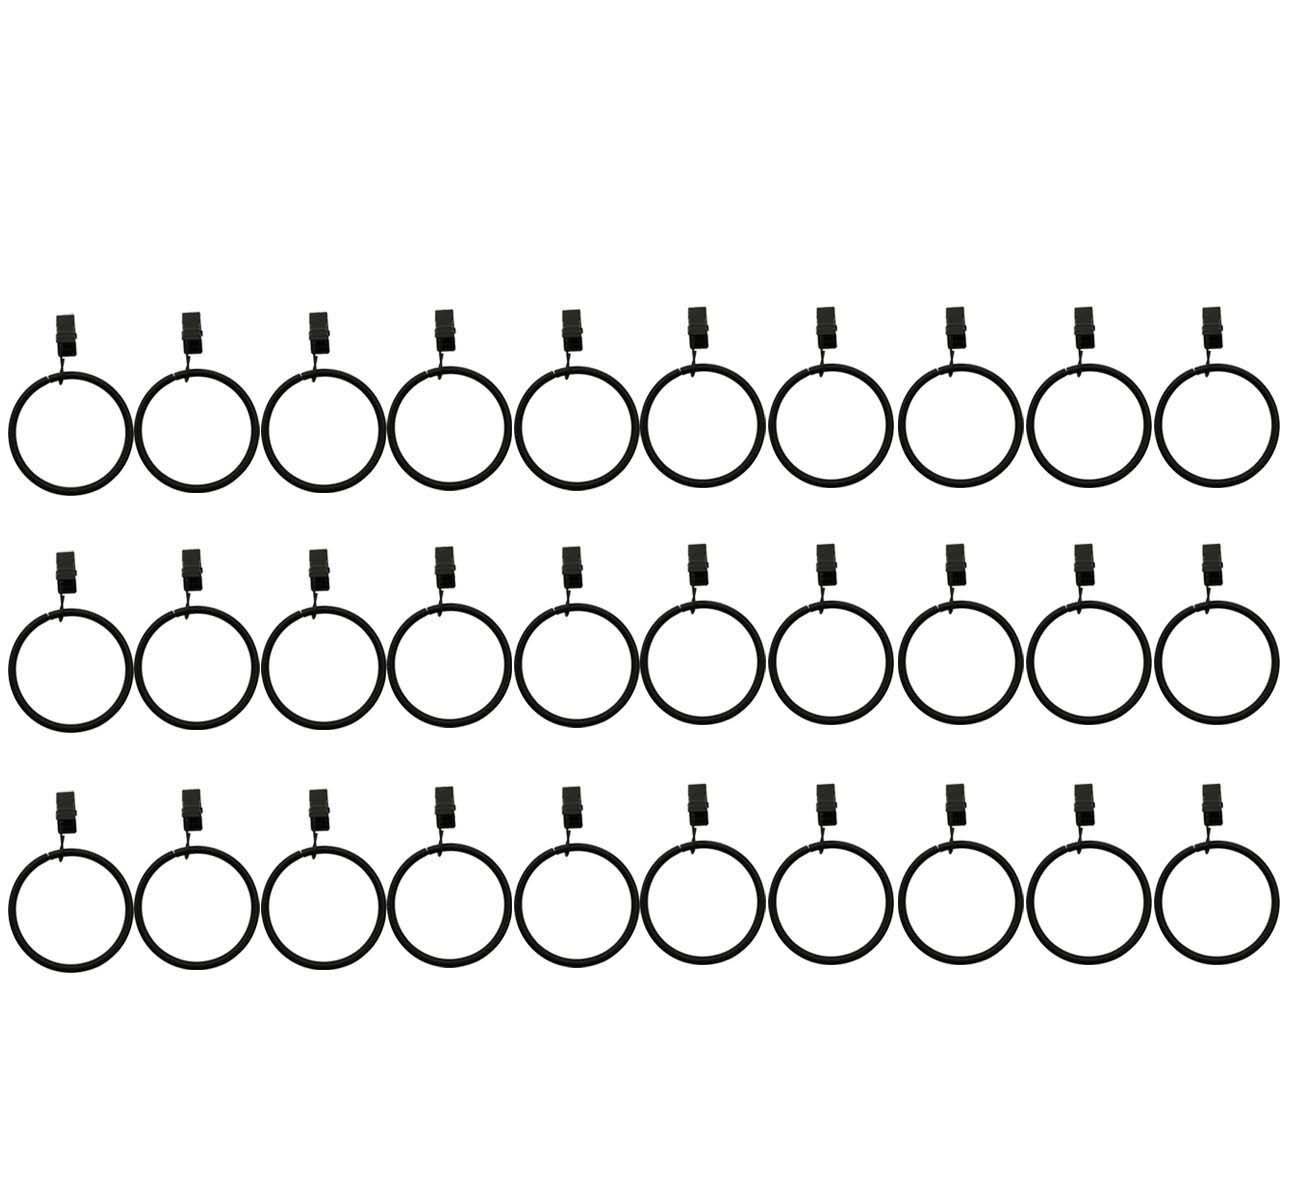 Saim Metal Drapery Curtain Clips With Rings 2'' Interior Diameter, Pack of 30